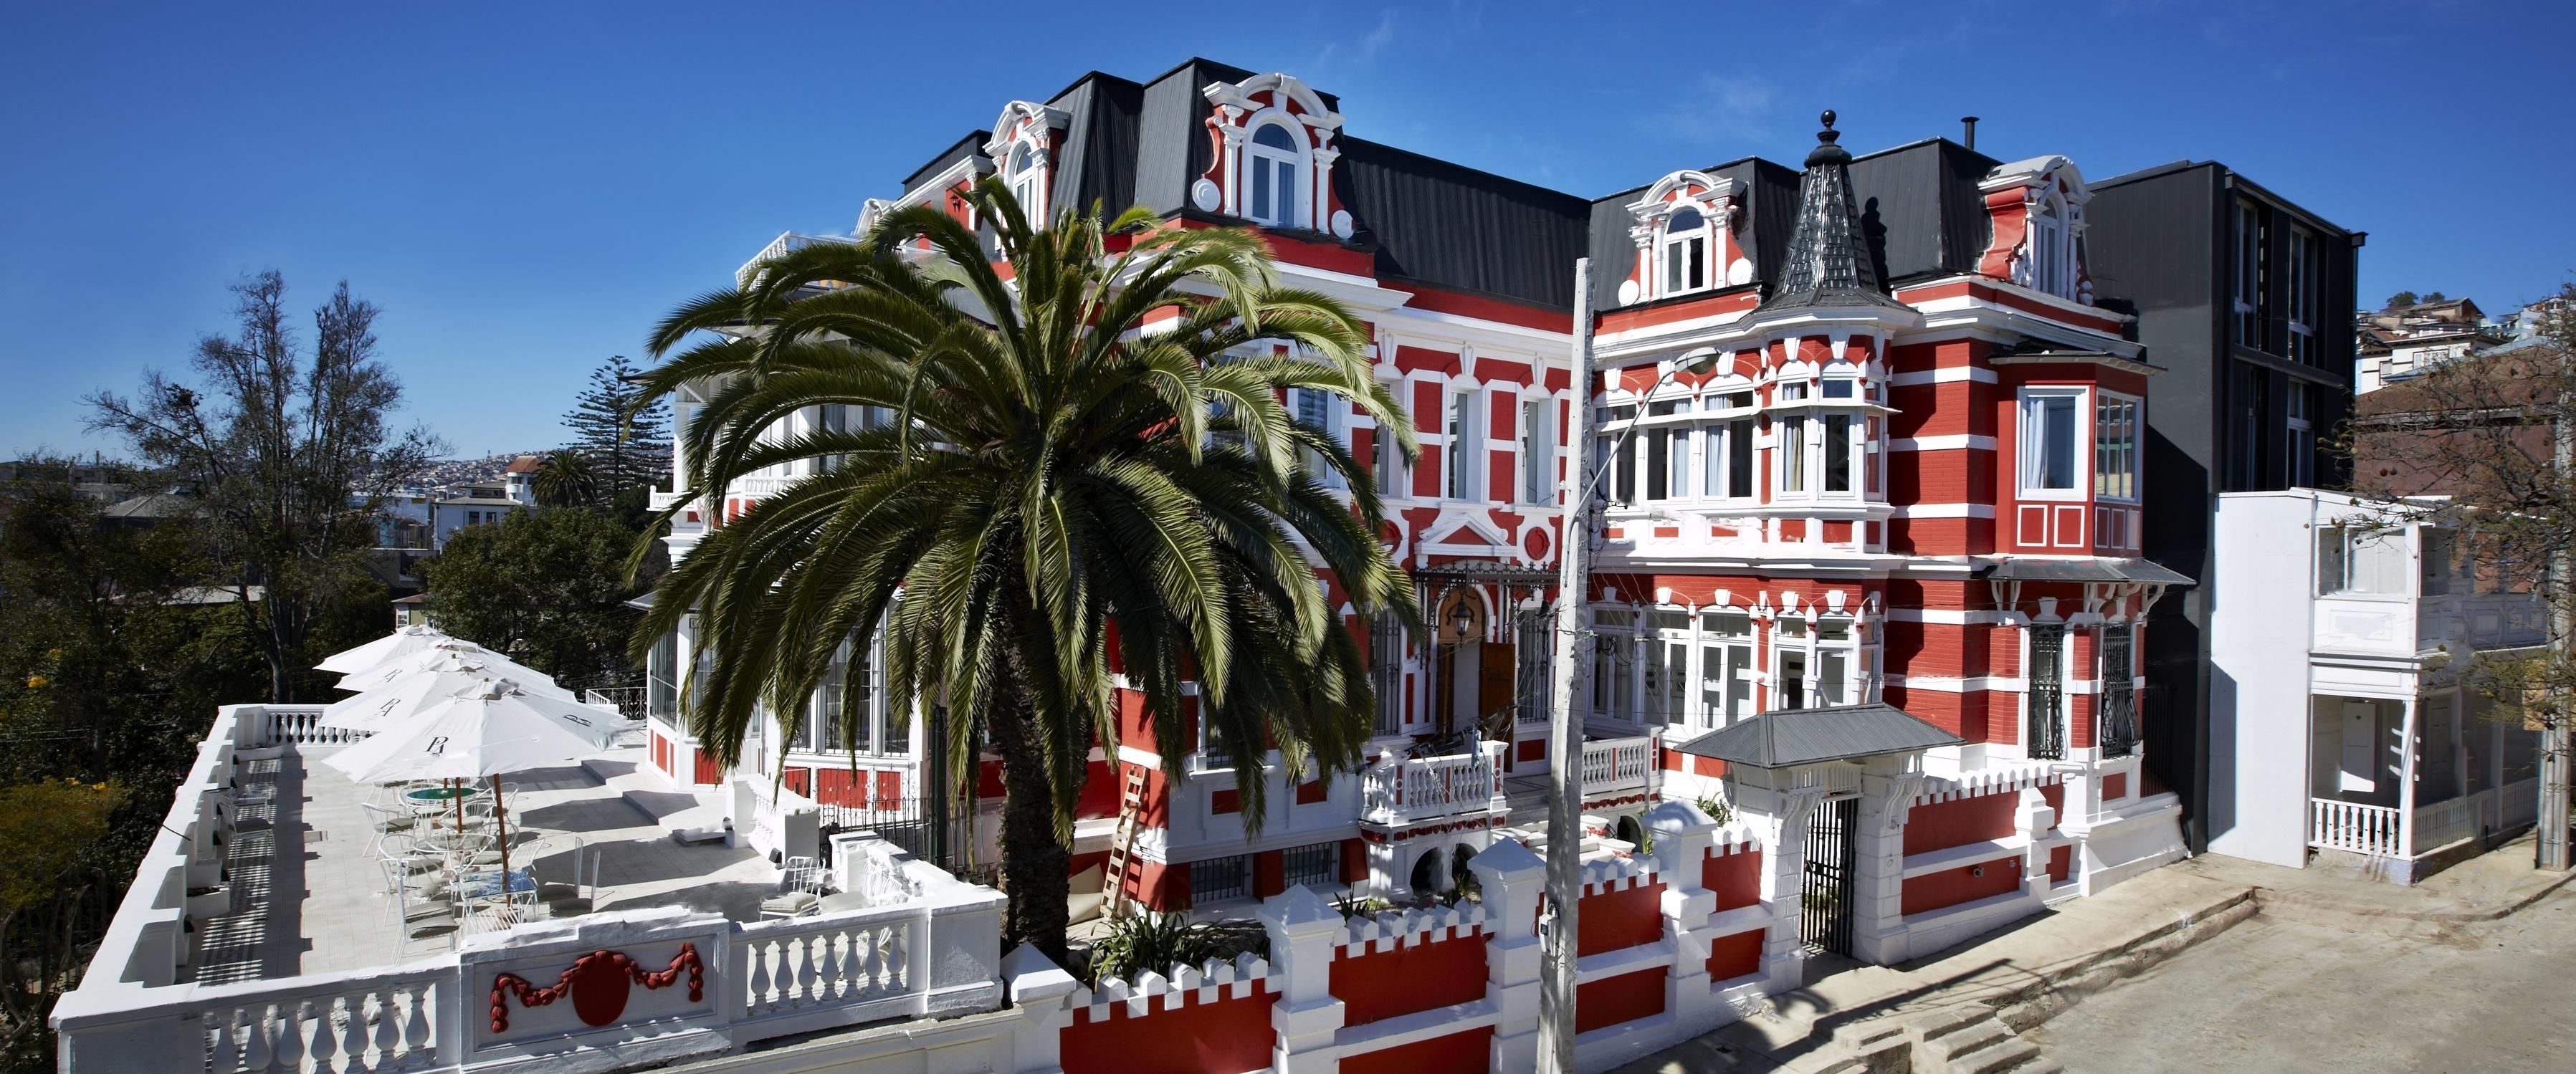 Hotel-Palacio-Astoreca-Valparaiso